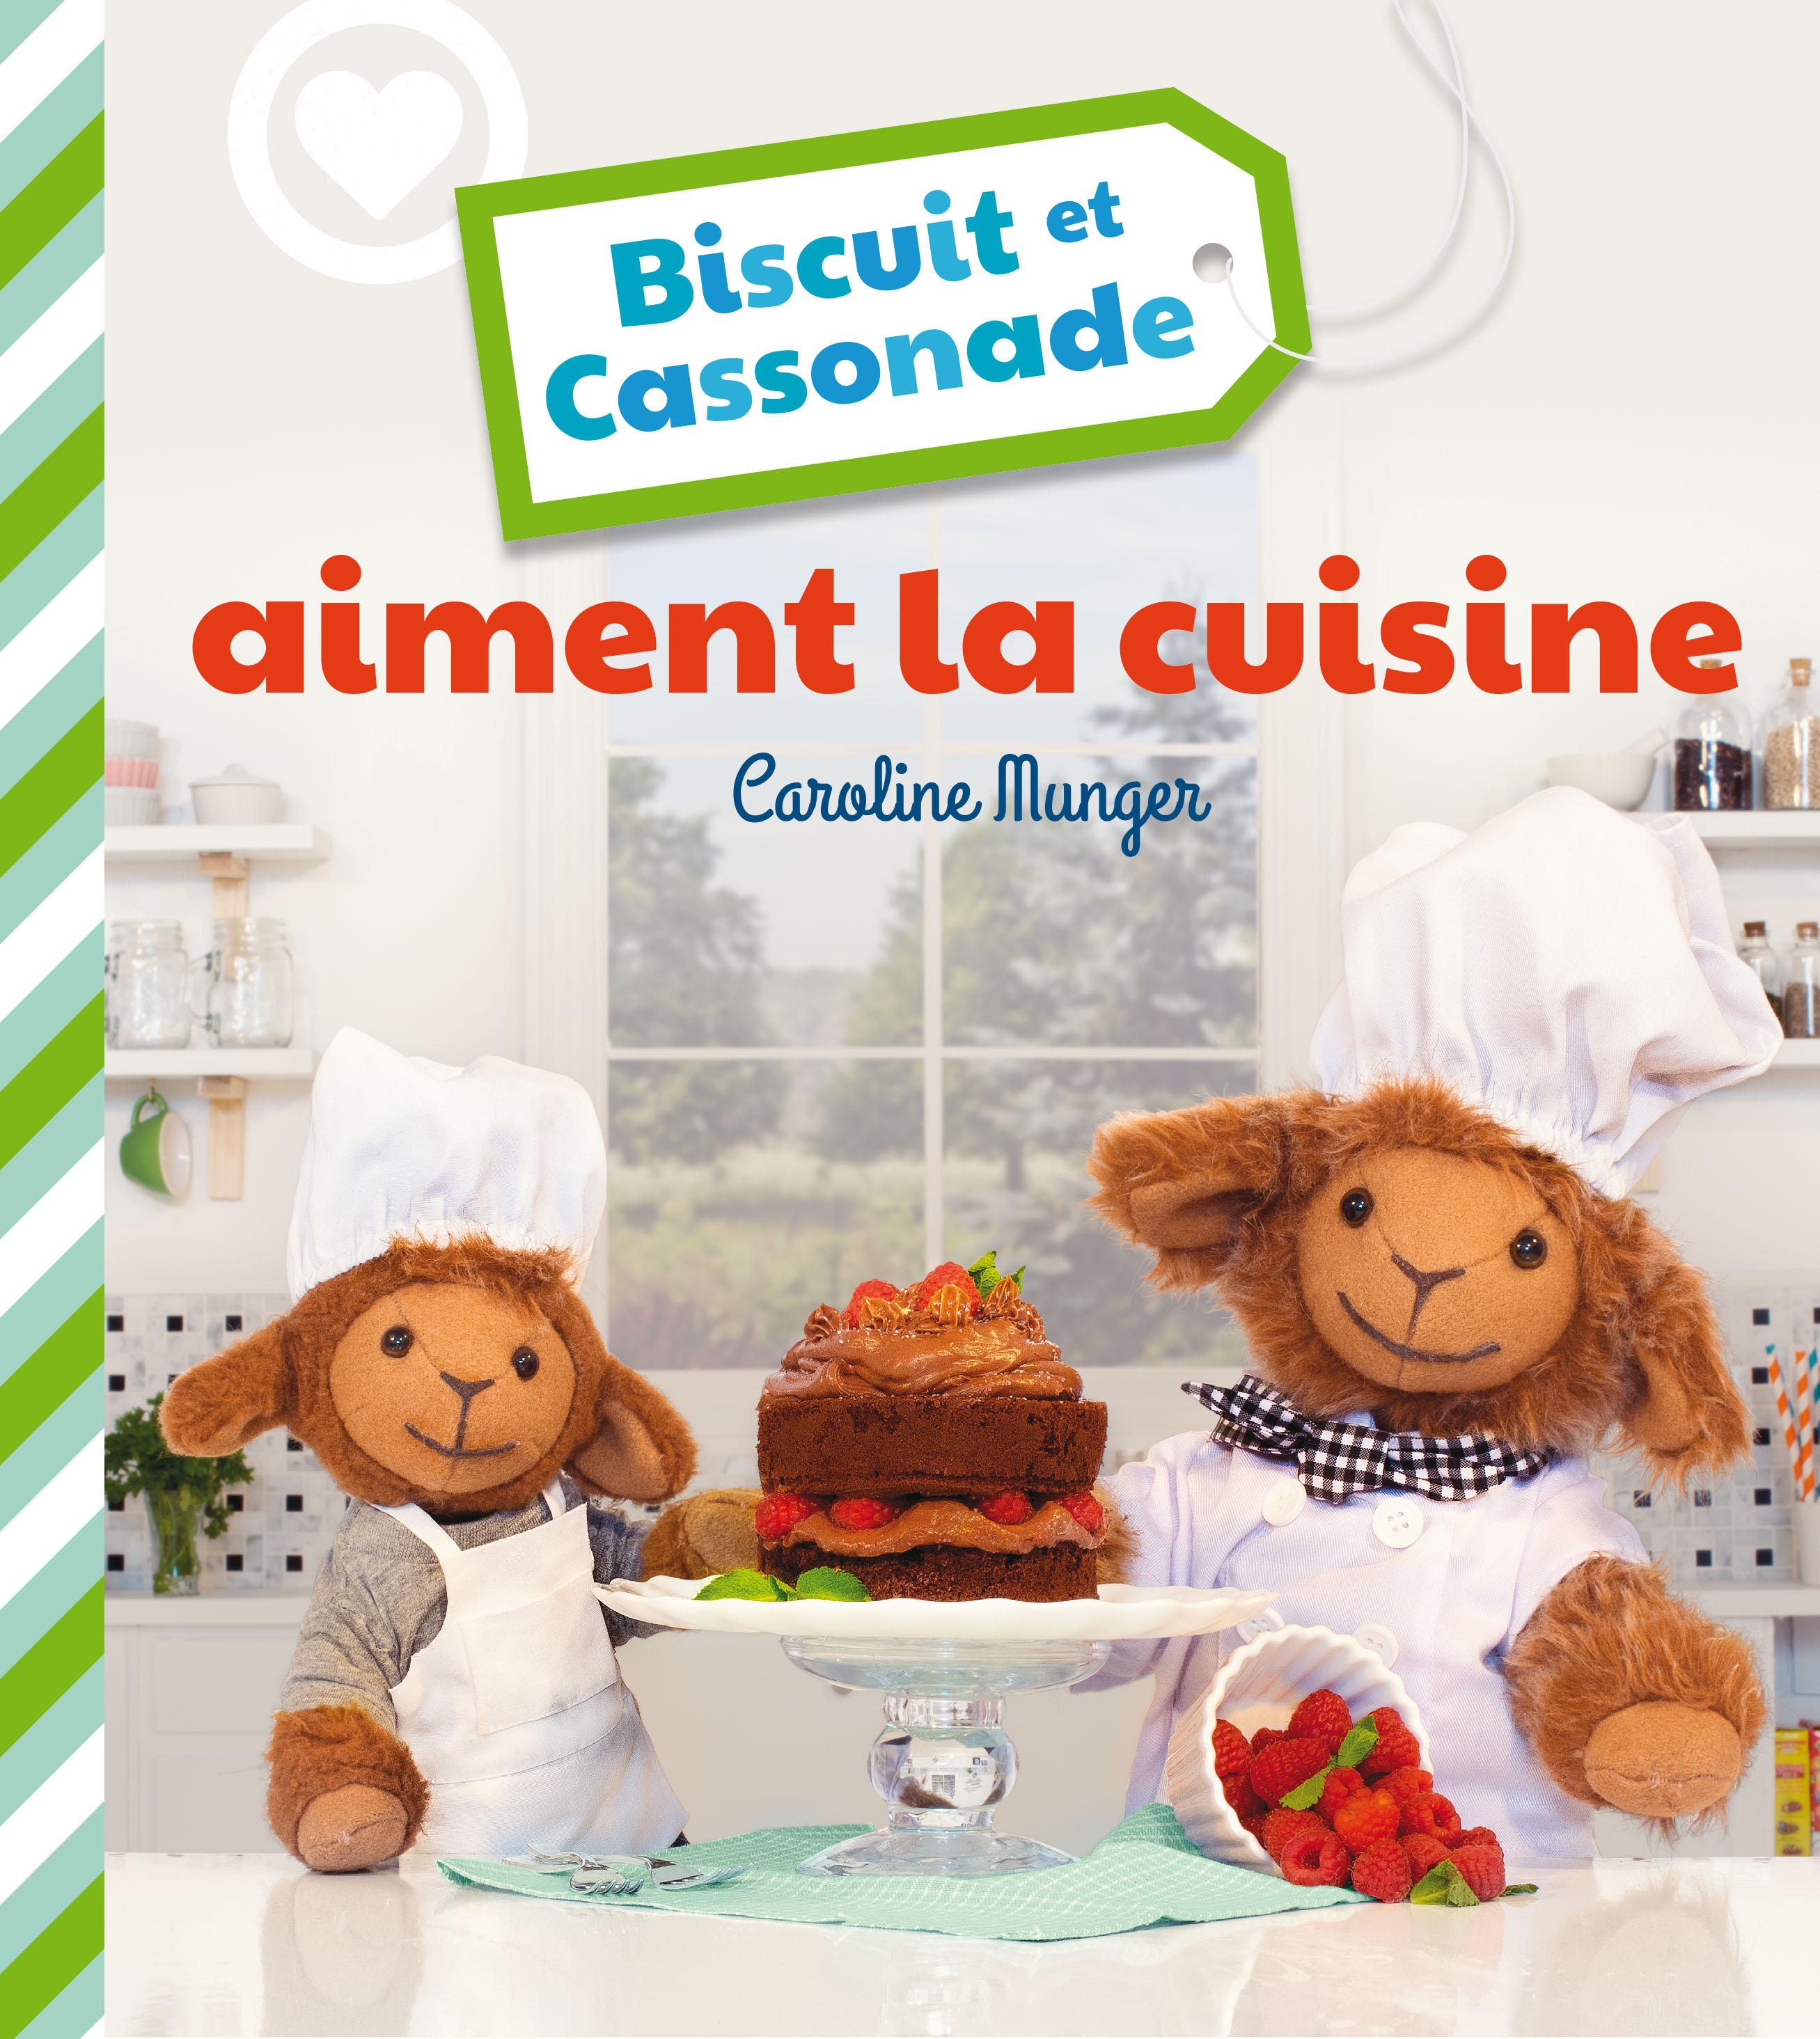 Biscuit et Cassonade aiment la cuisine